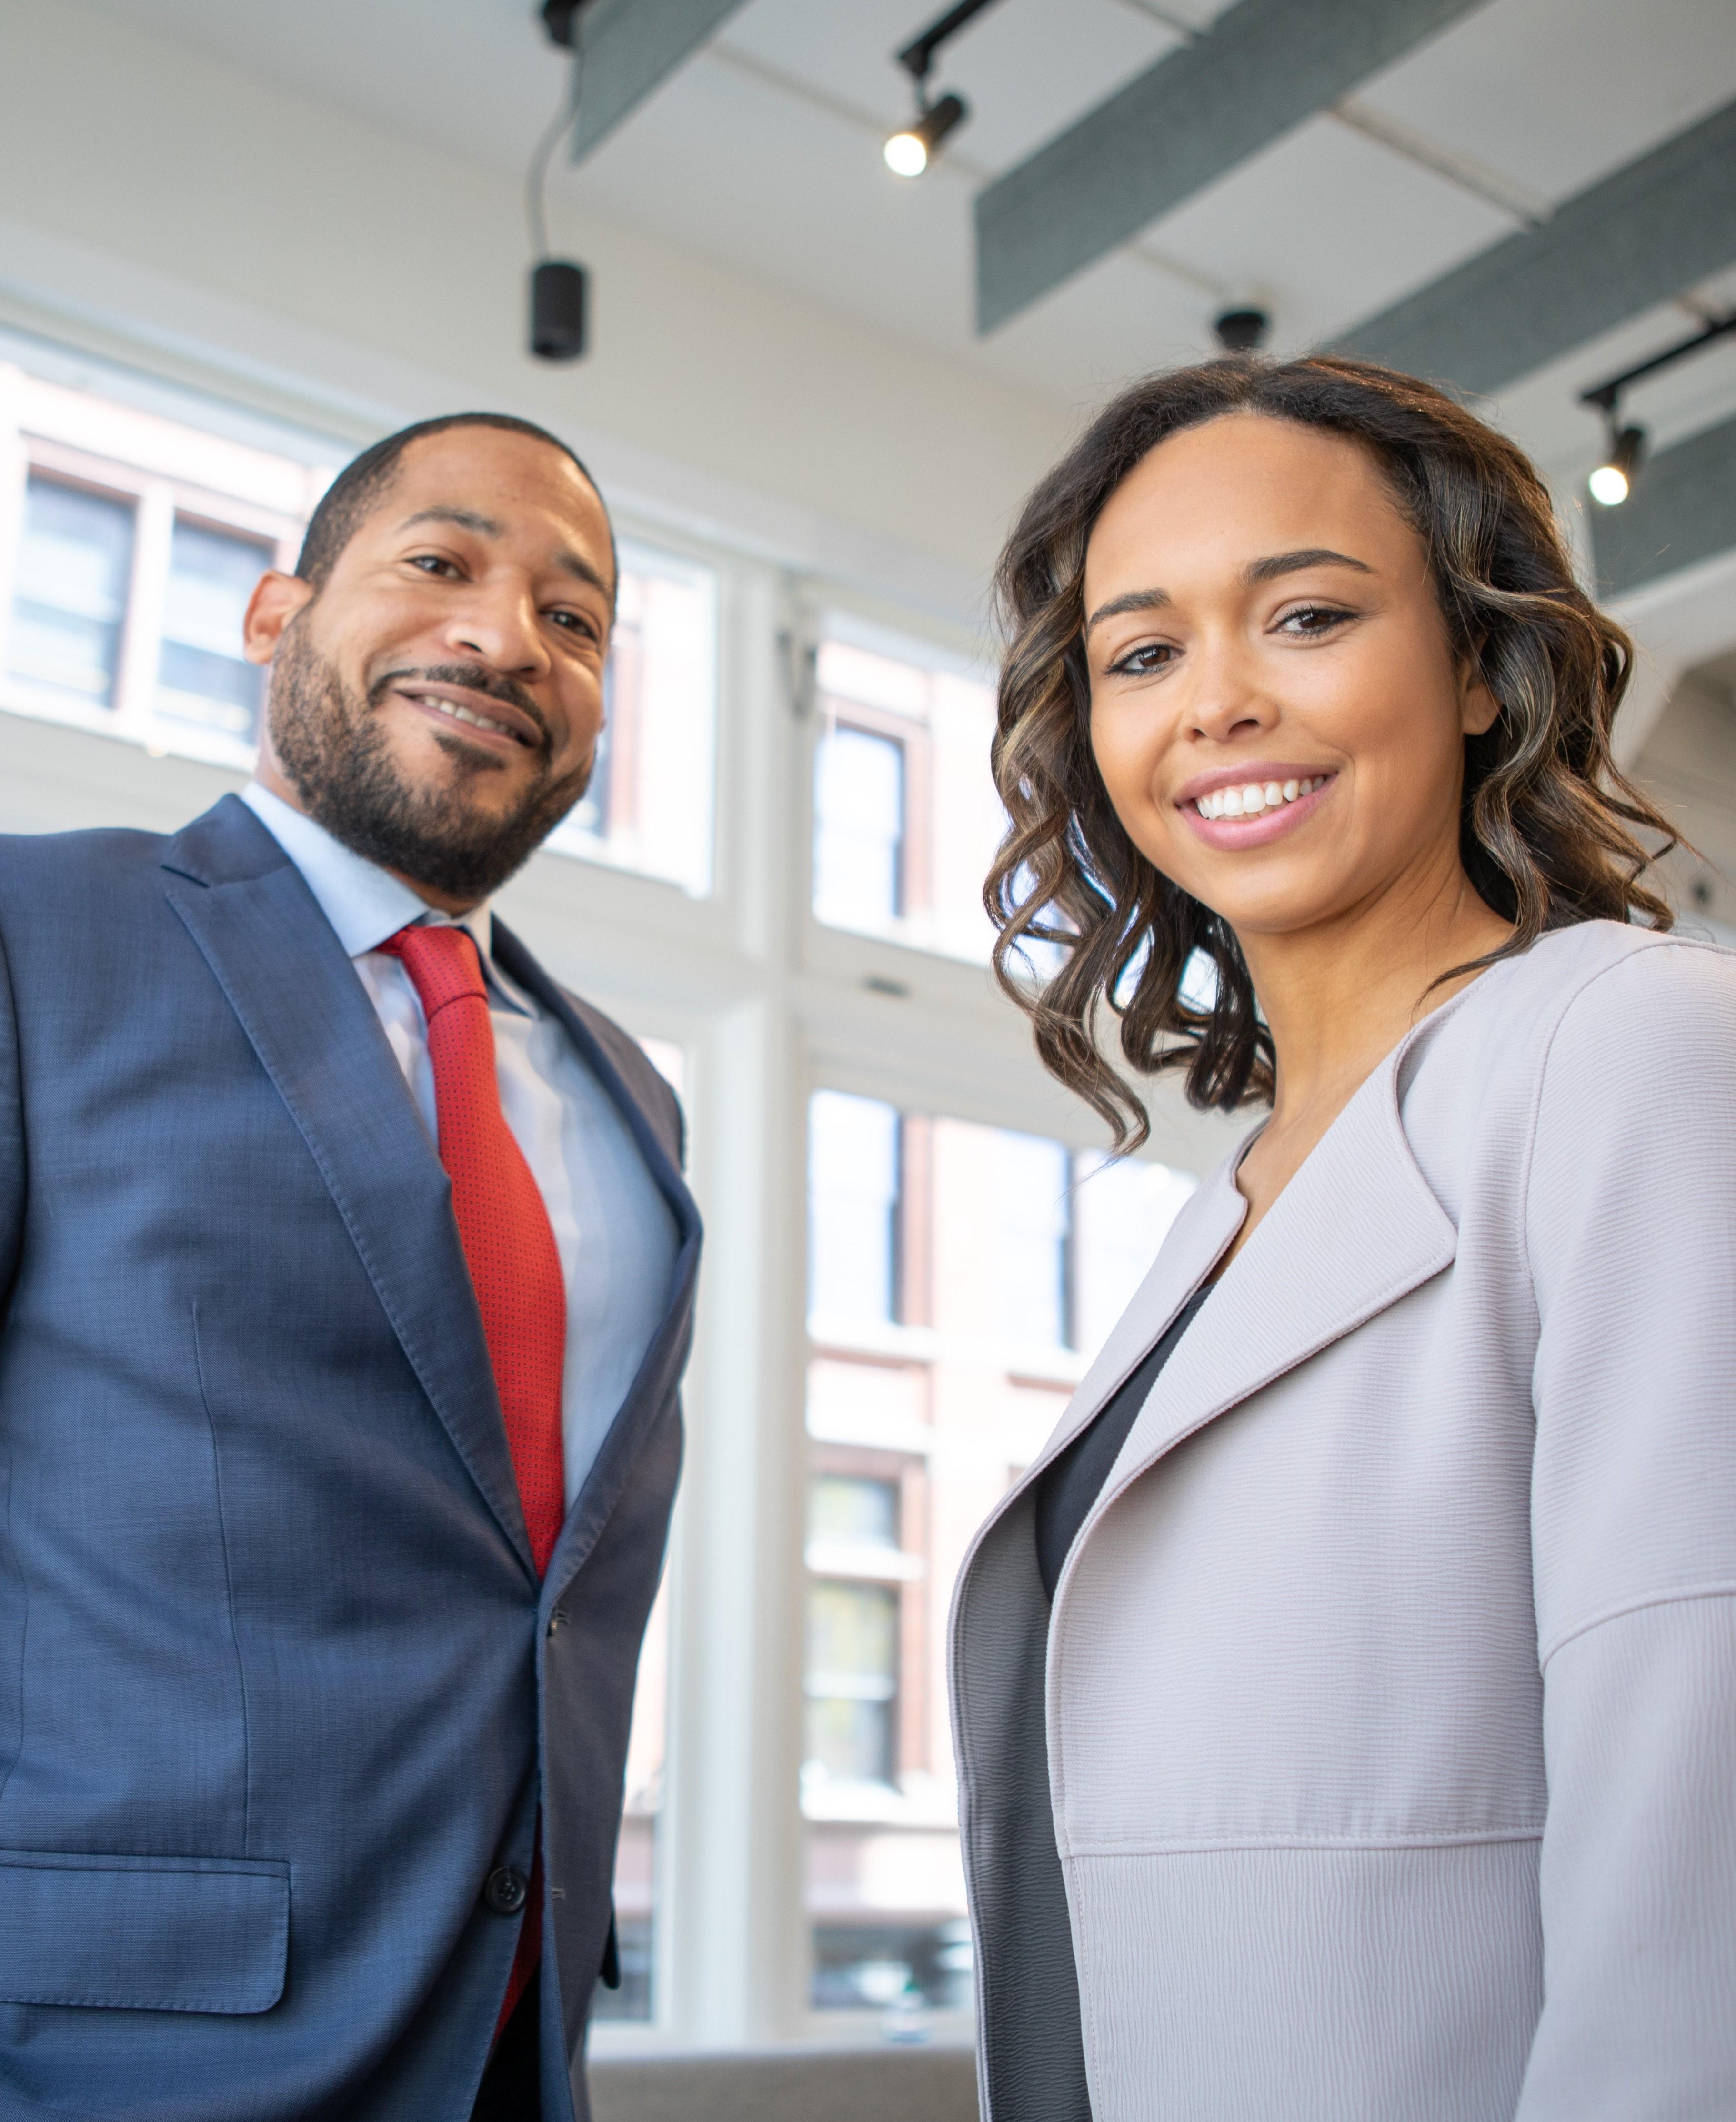 Business owner Bellevue, WA Voya Financial Advisors